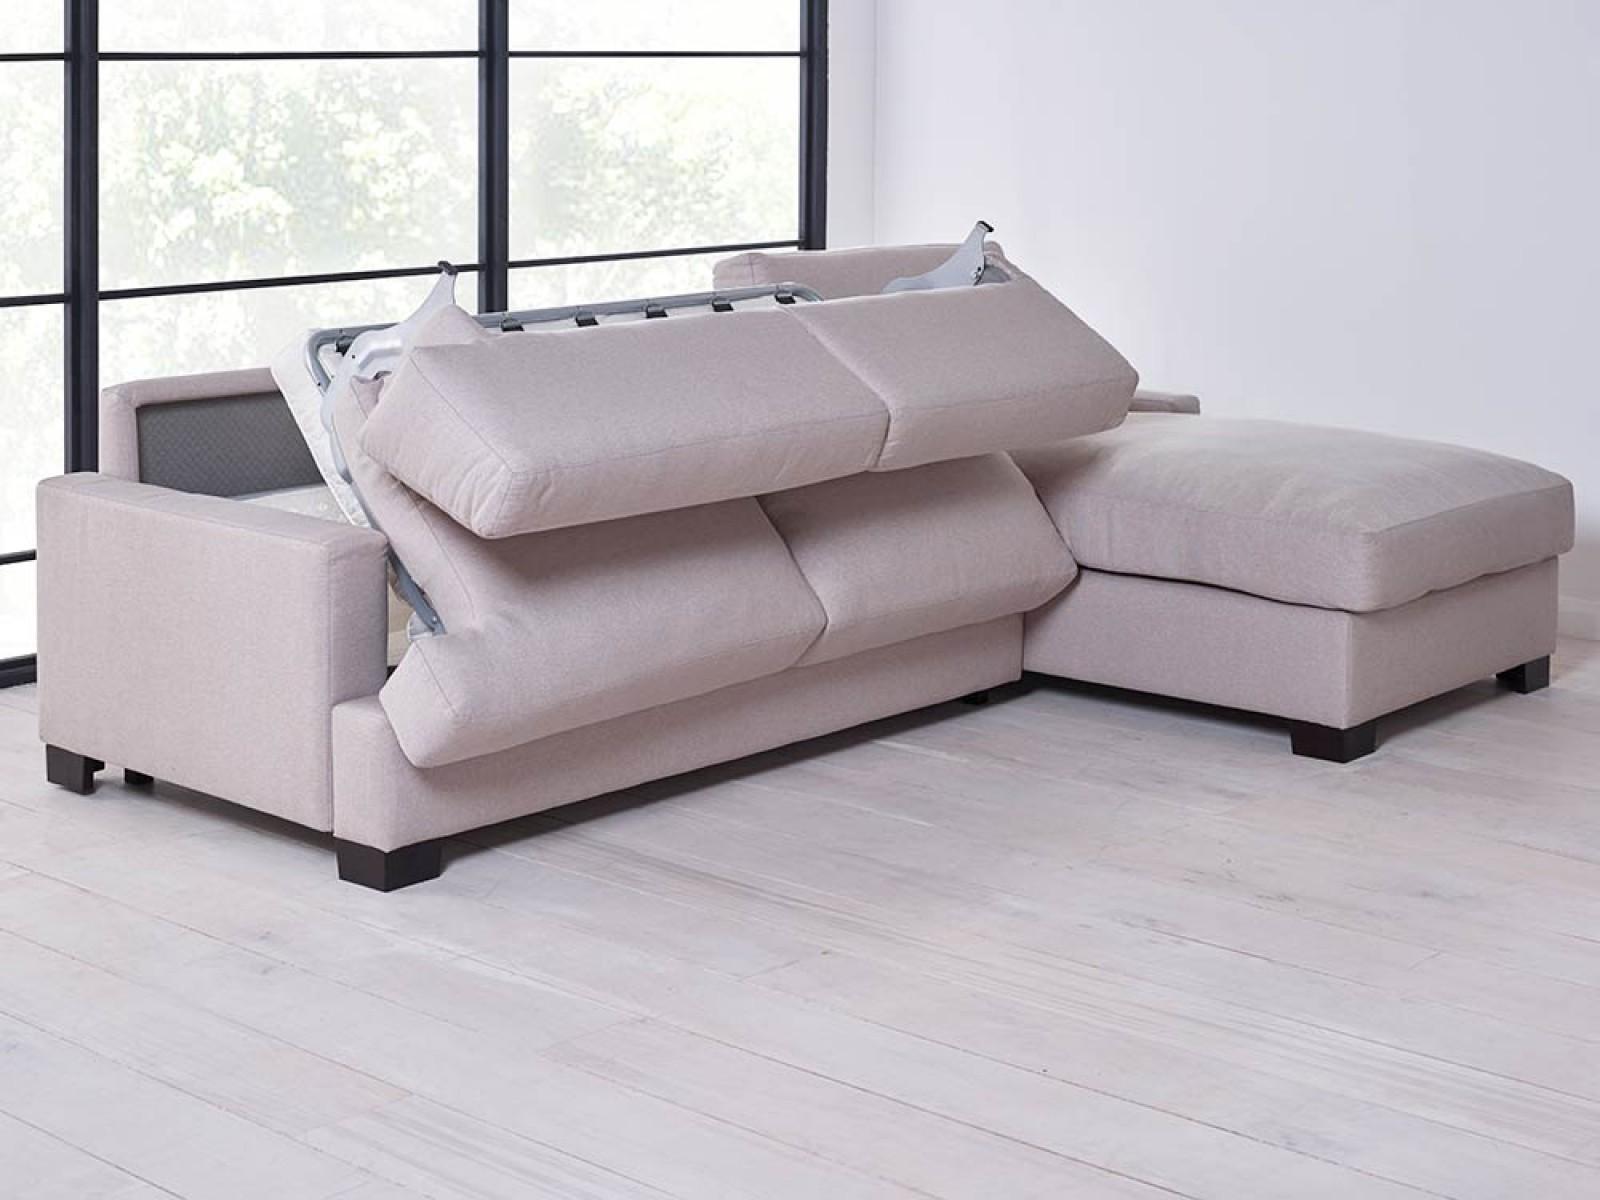 ... daphne corner sofa bed ... BTTKRBH